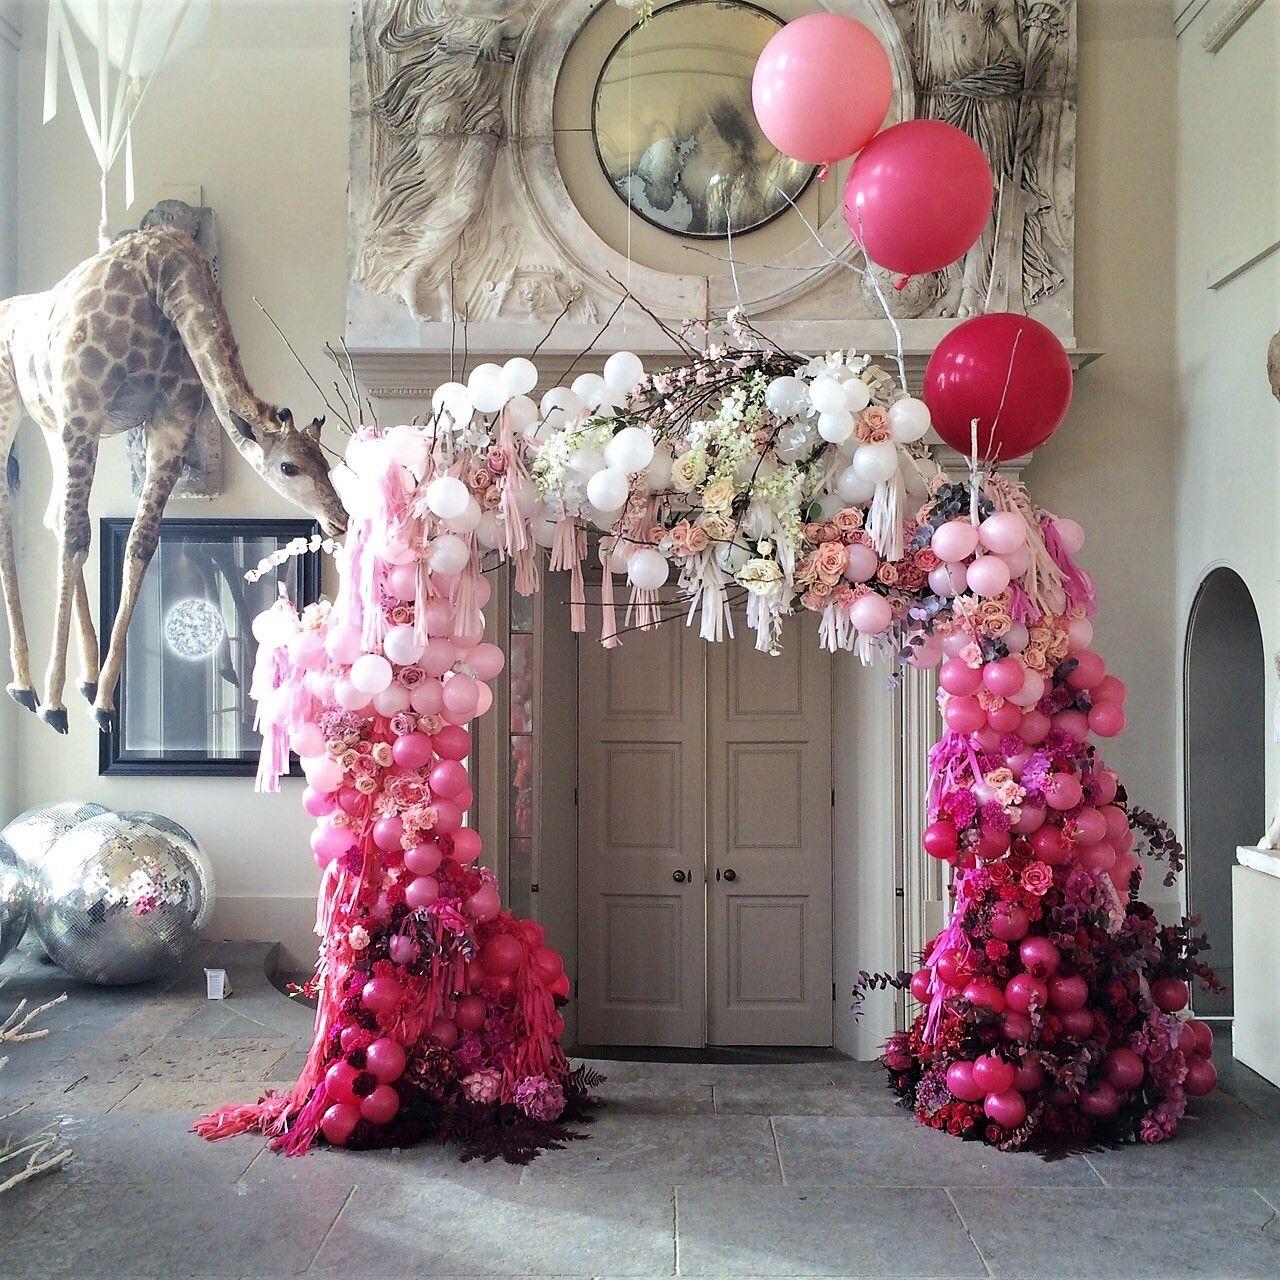 Balloon Wedding Decorations Ideas: Wedding Balloons, Wedding Inspiration, Wedding Decorations